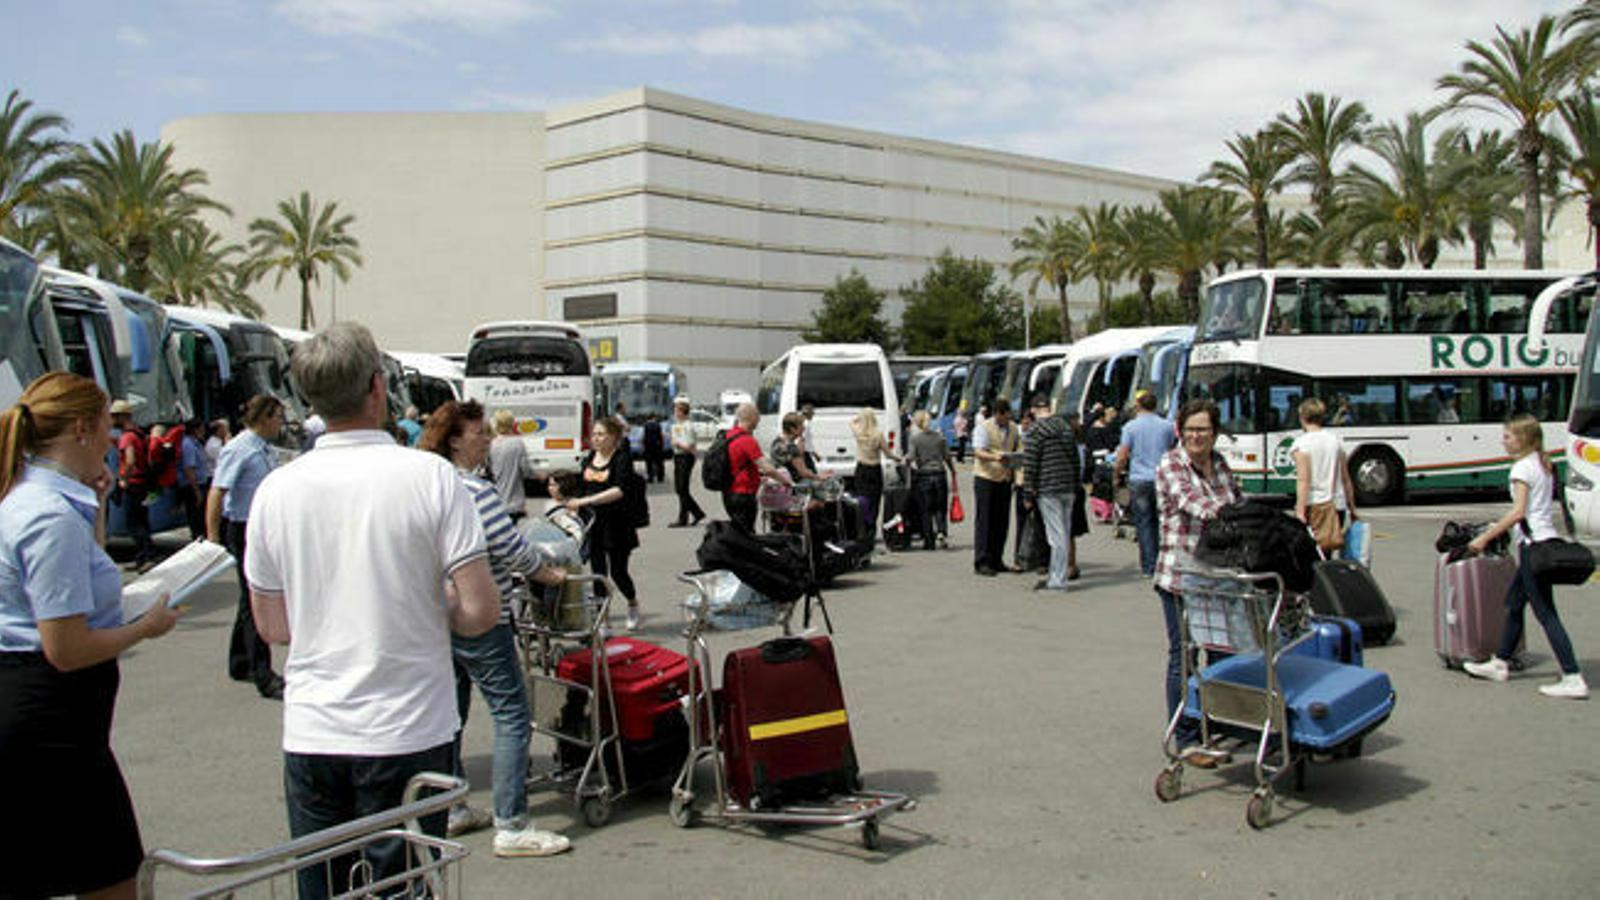 Passatgers a l'aeroport de Son Sant Joan. / ARA BALEARS